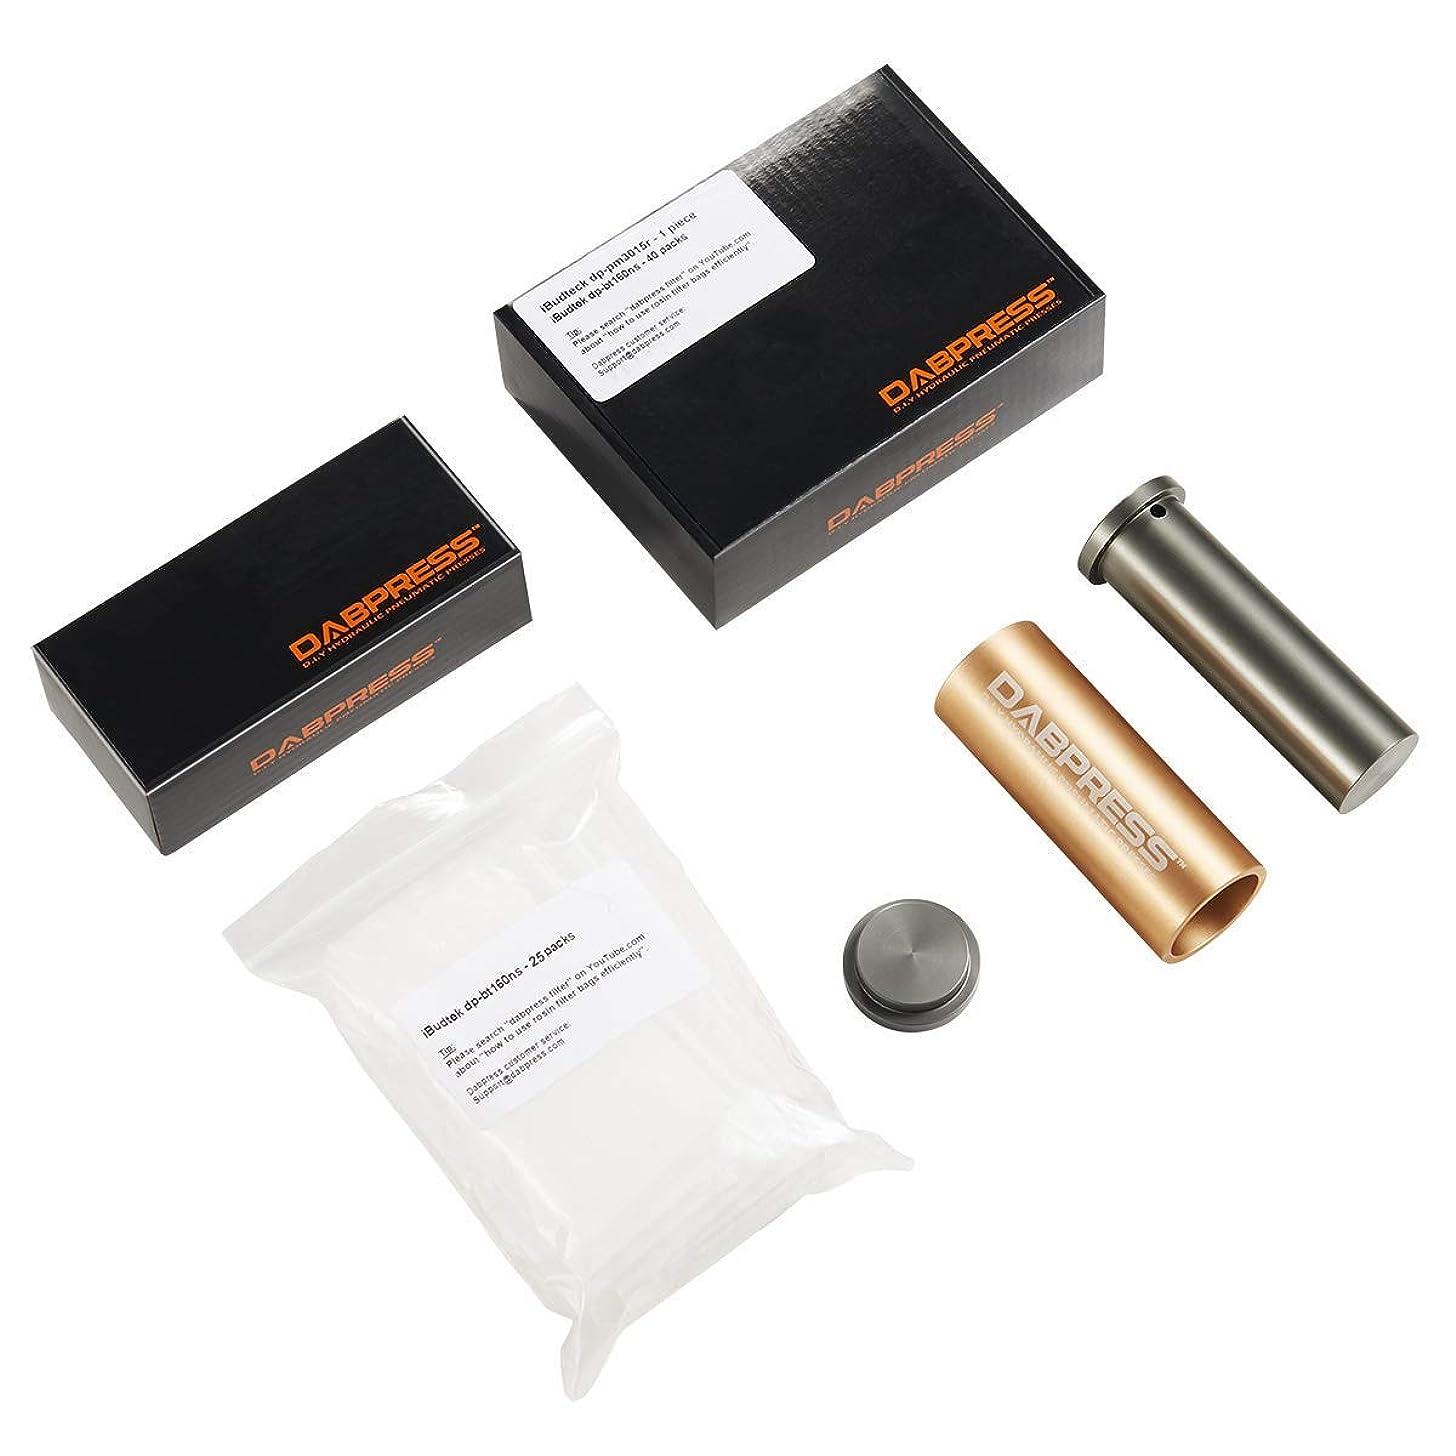 Cylinder Pre Press Mold + 40 Packs Filter Bags [2x4 Inch 160 Micron] | iBudtek dp-pm3015r + dp-bt160ns